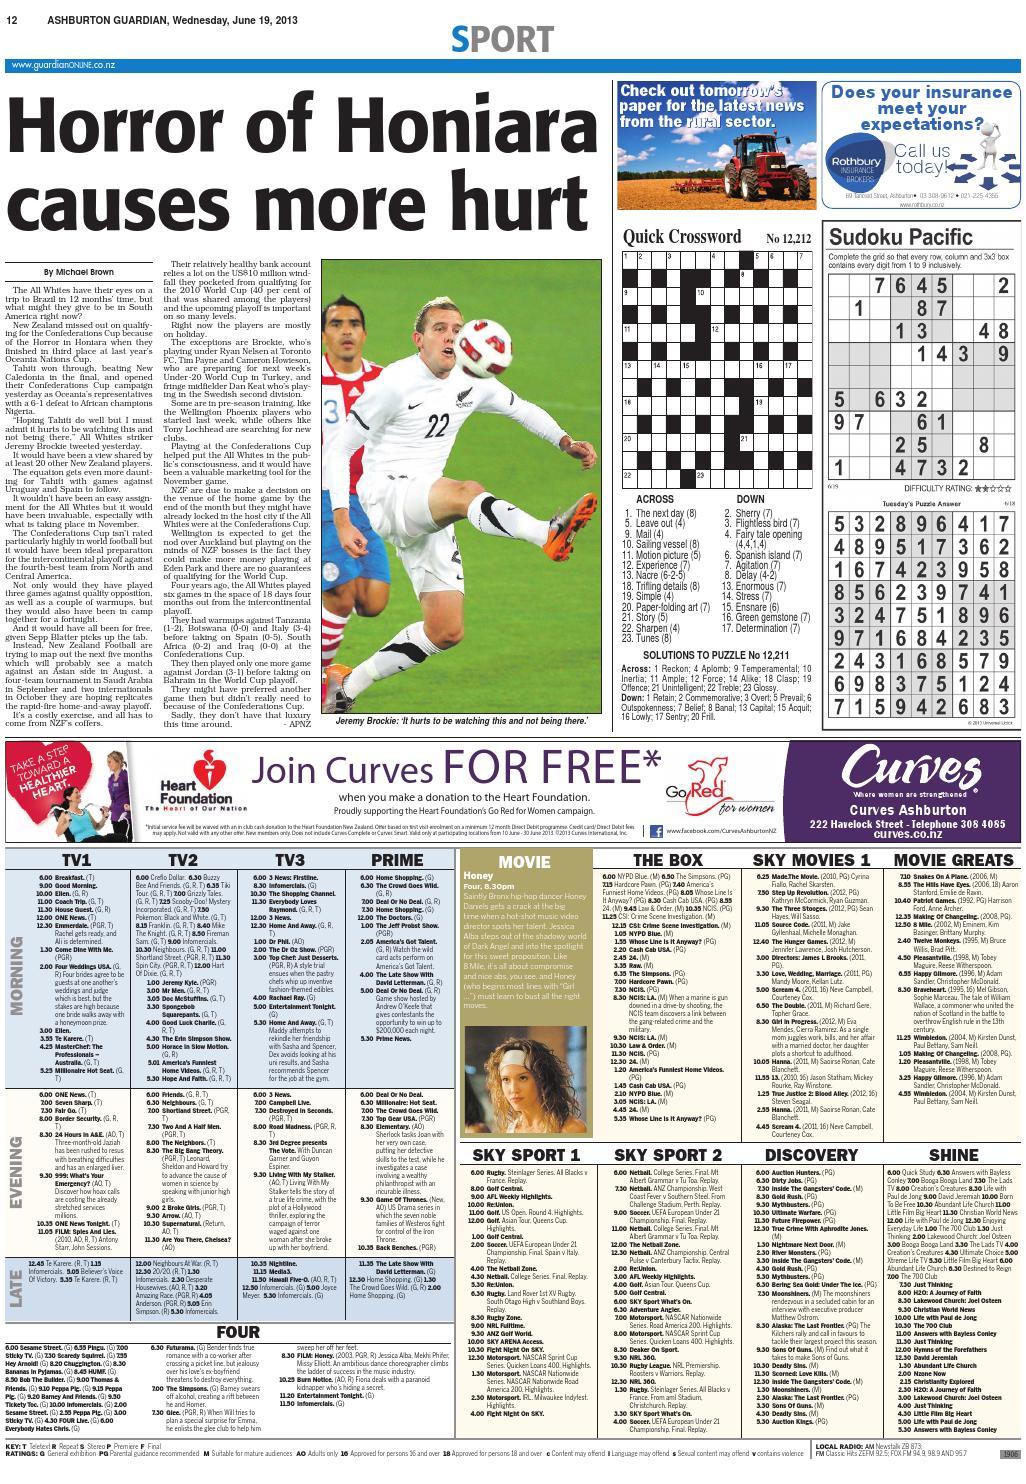 Ashburton Guardian, June 19 2013